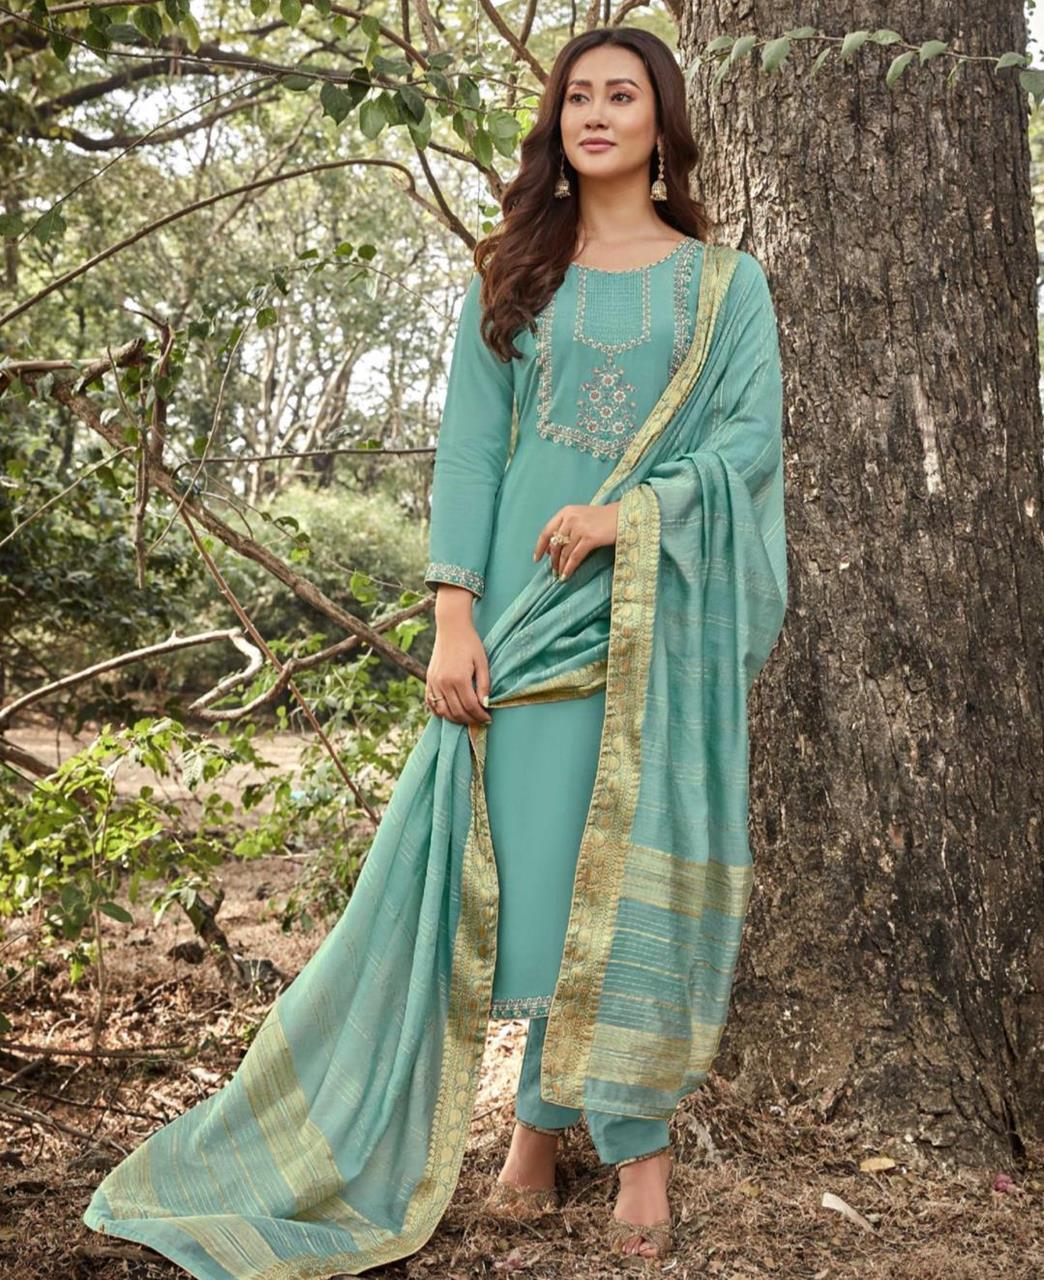 Zari Cotton Straight cut Salwar Kameez in Sky Blue